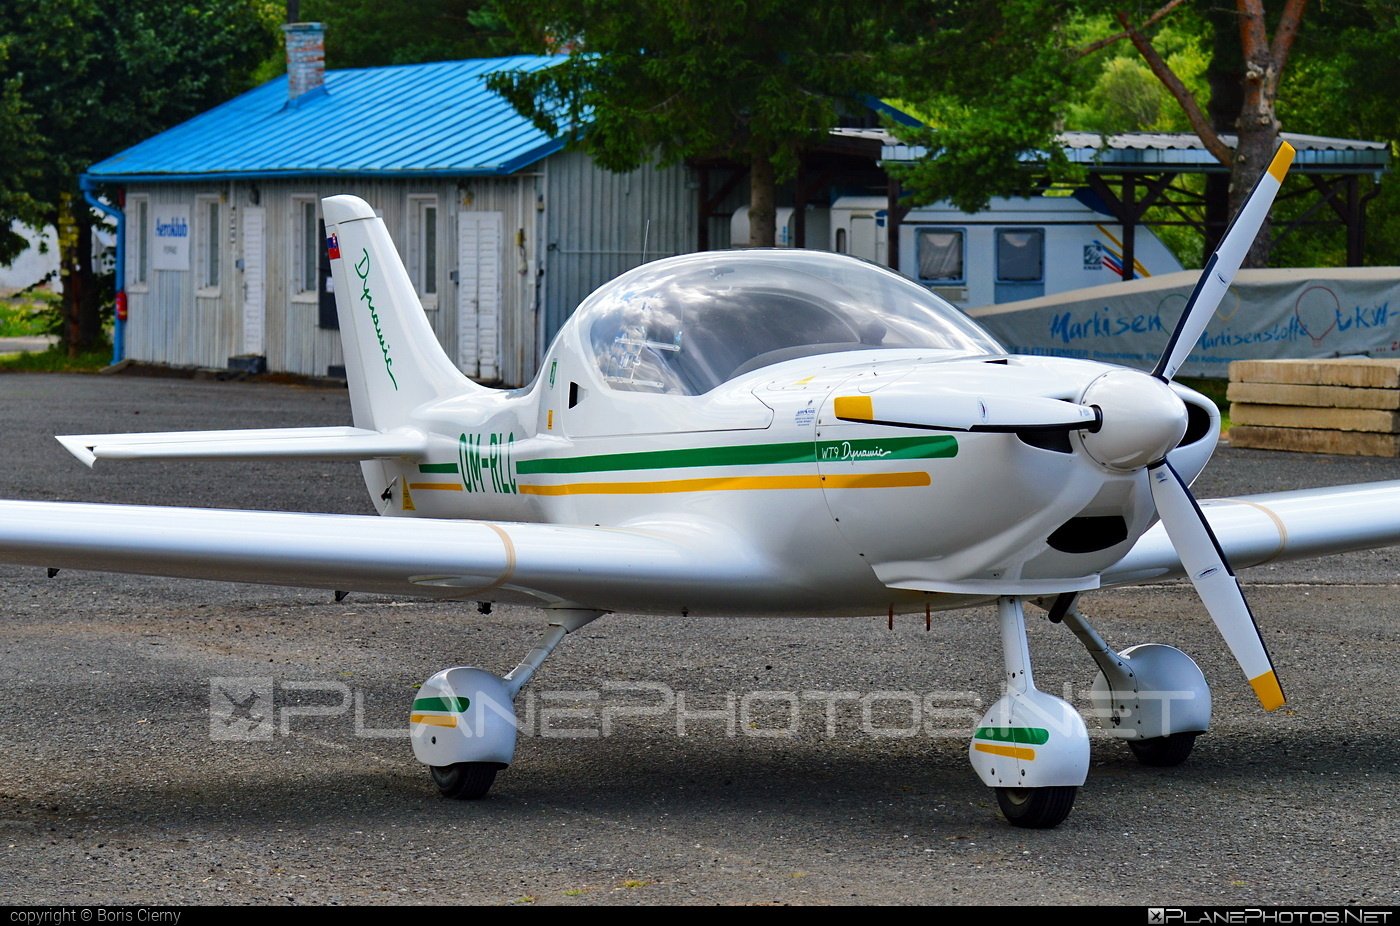 Aerospool WT9 Dynamic - OM-RLC operated by Slovenský národný aeroklub (Slovak National Aeroclub) #aerospool #wt9 #wt9dynamic